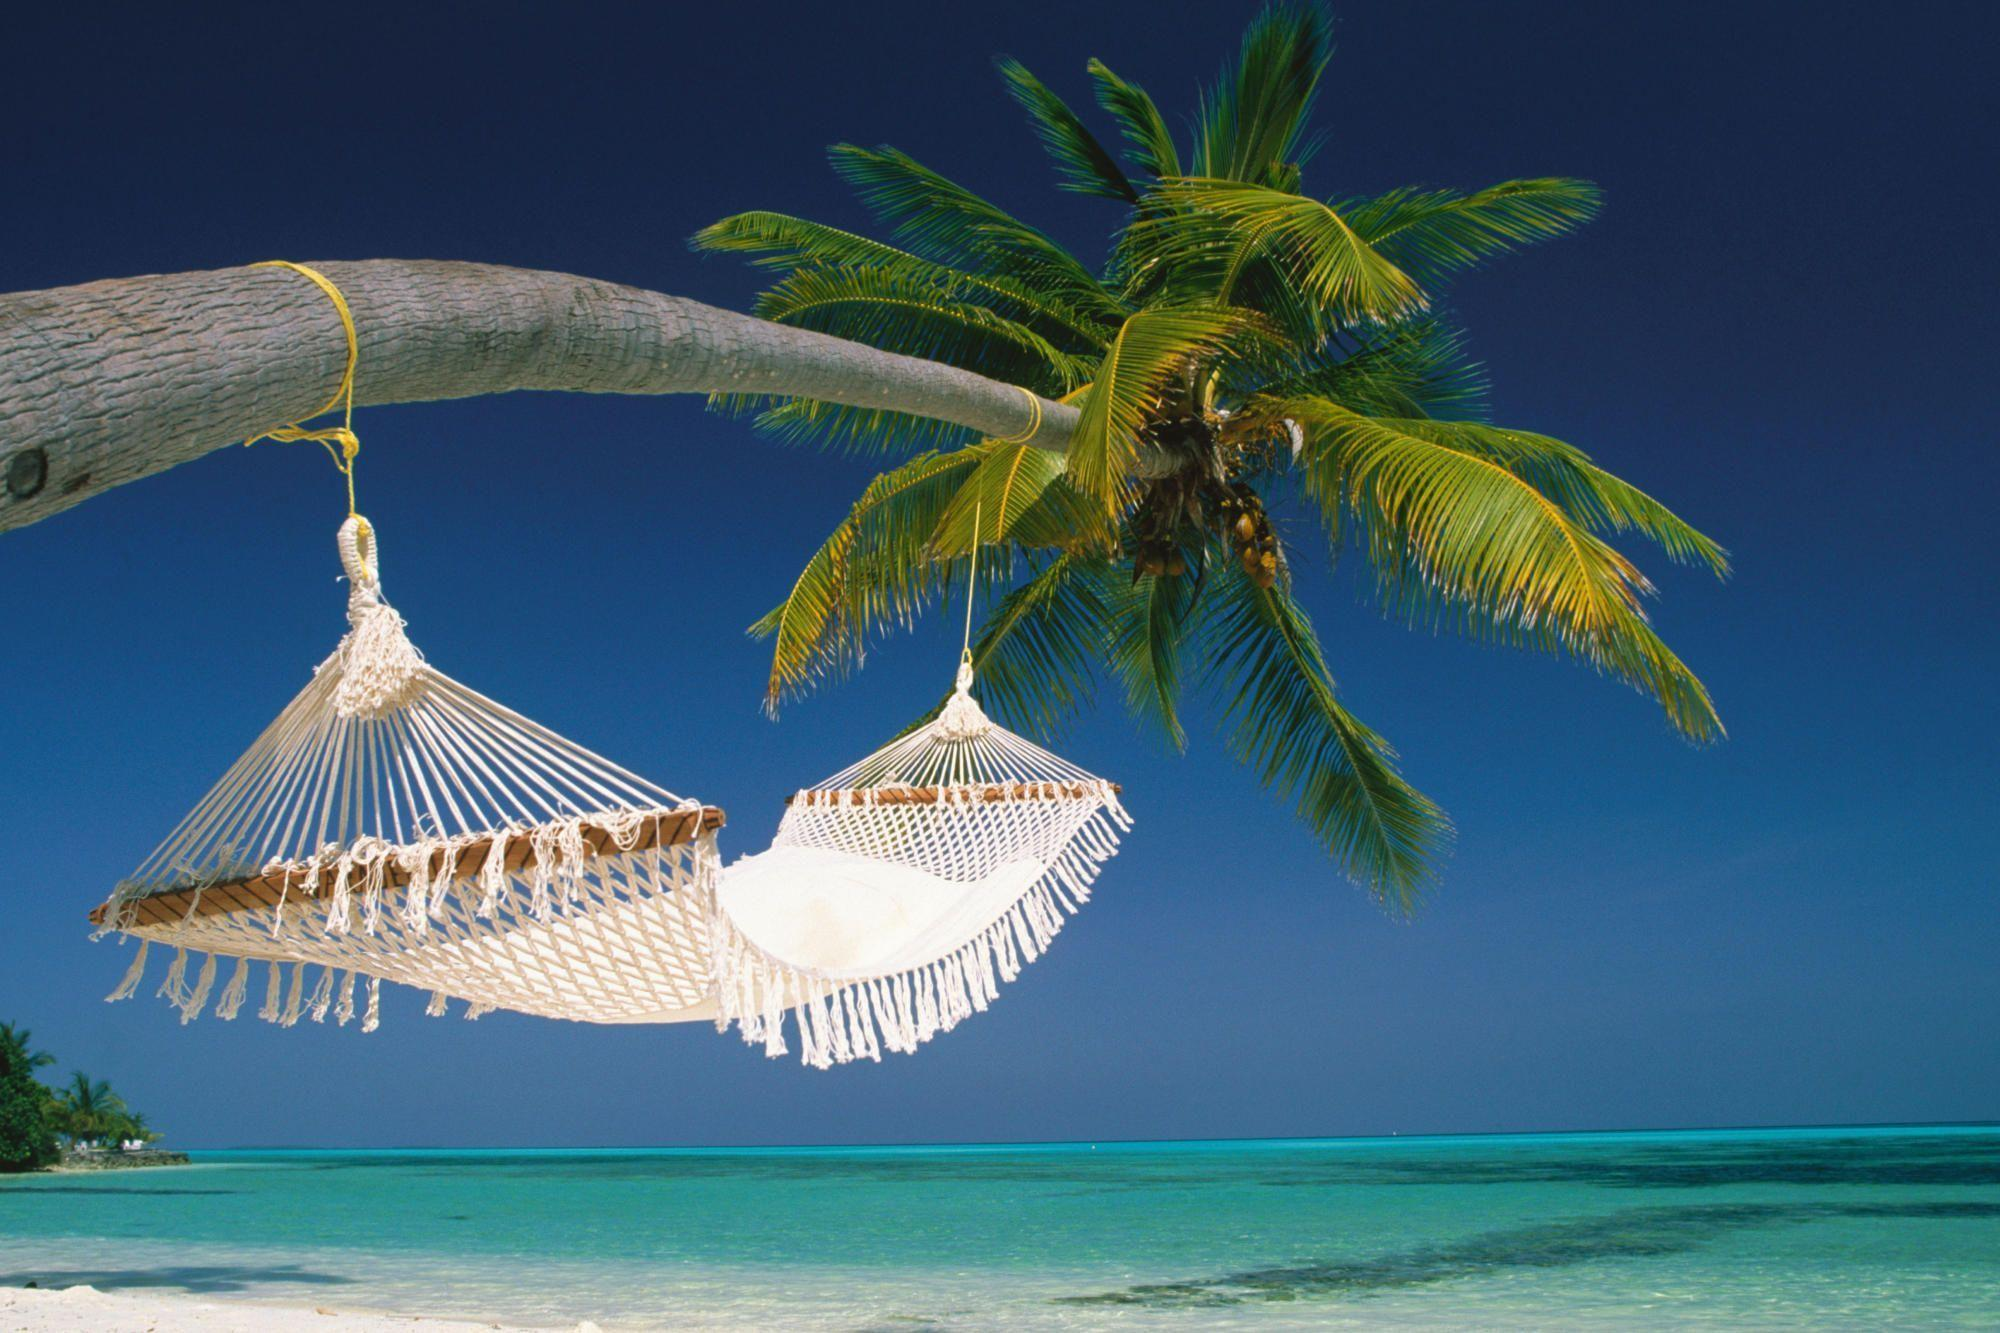 Tropical Island Desktop Wallpapers 2000x1333